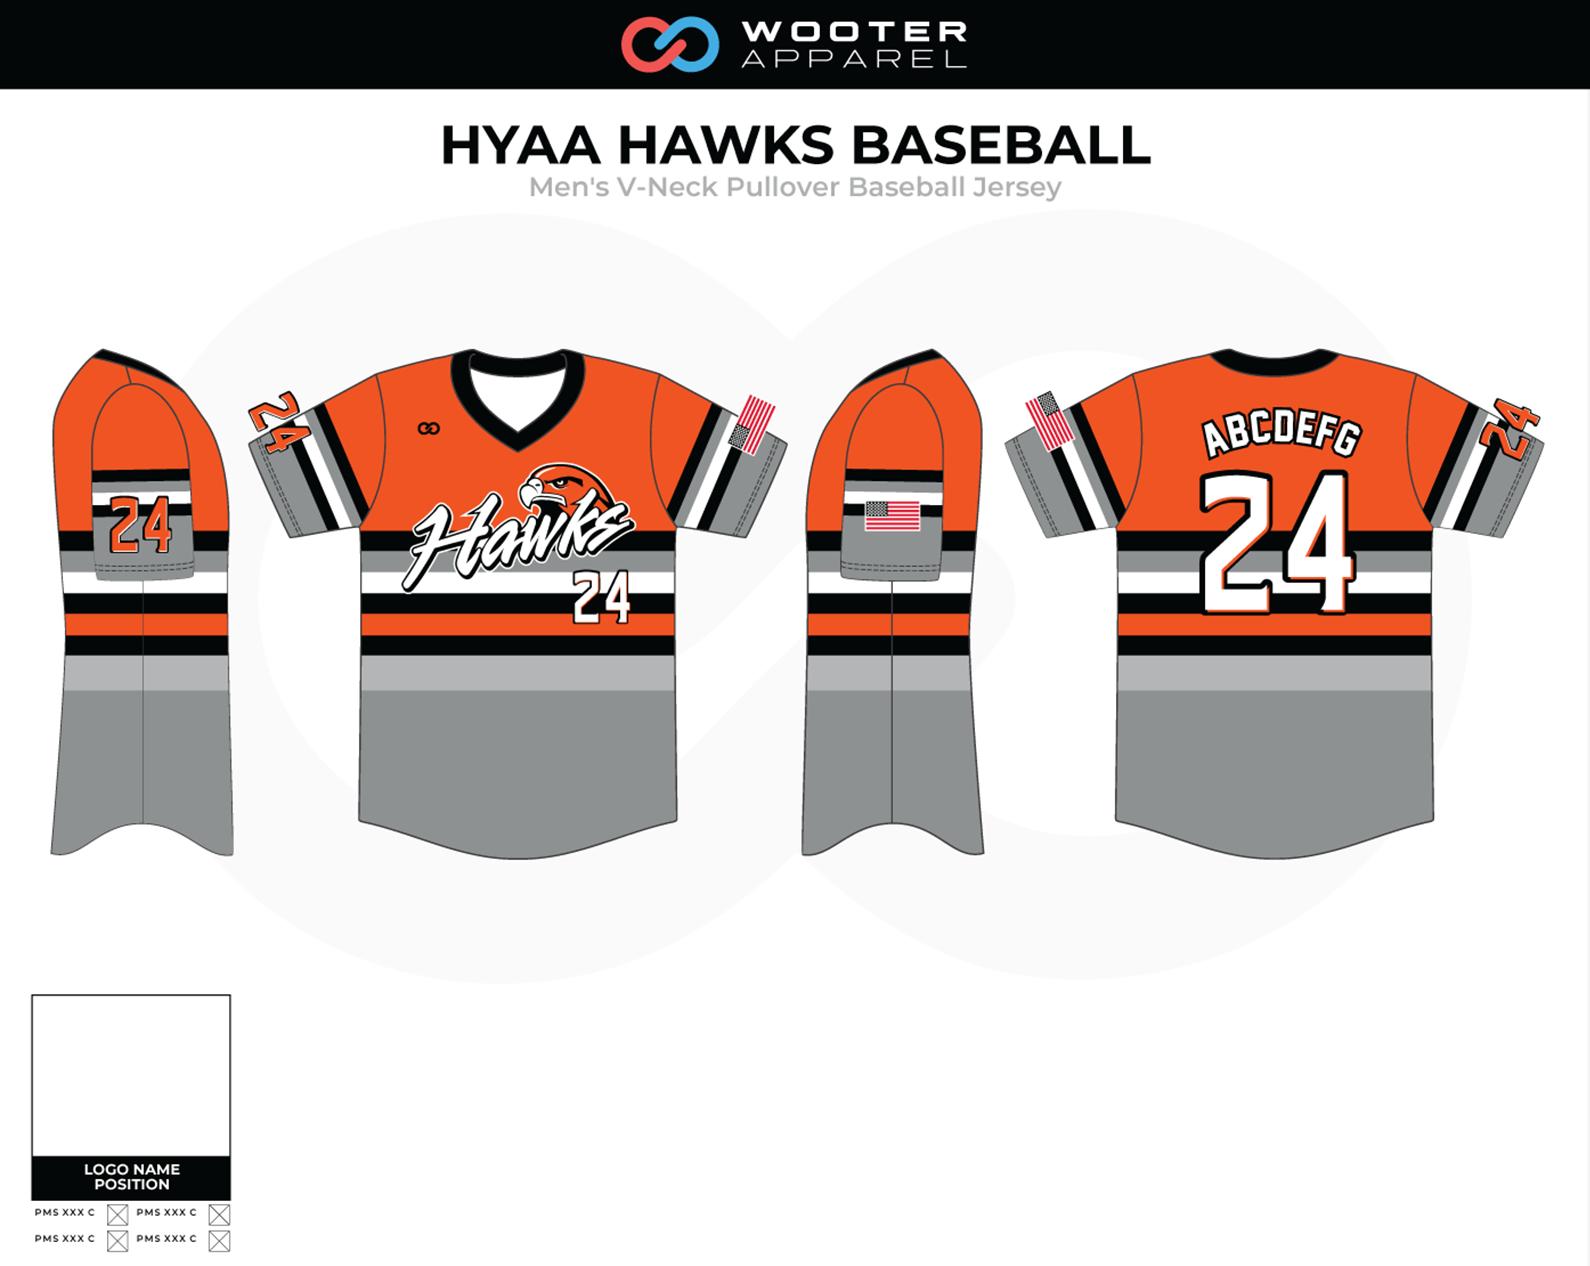 HYAAHawksBaseball_JerseyMockupV1.png